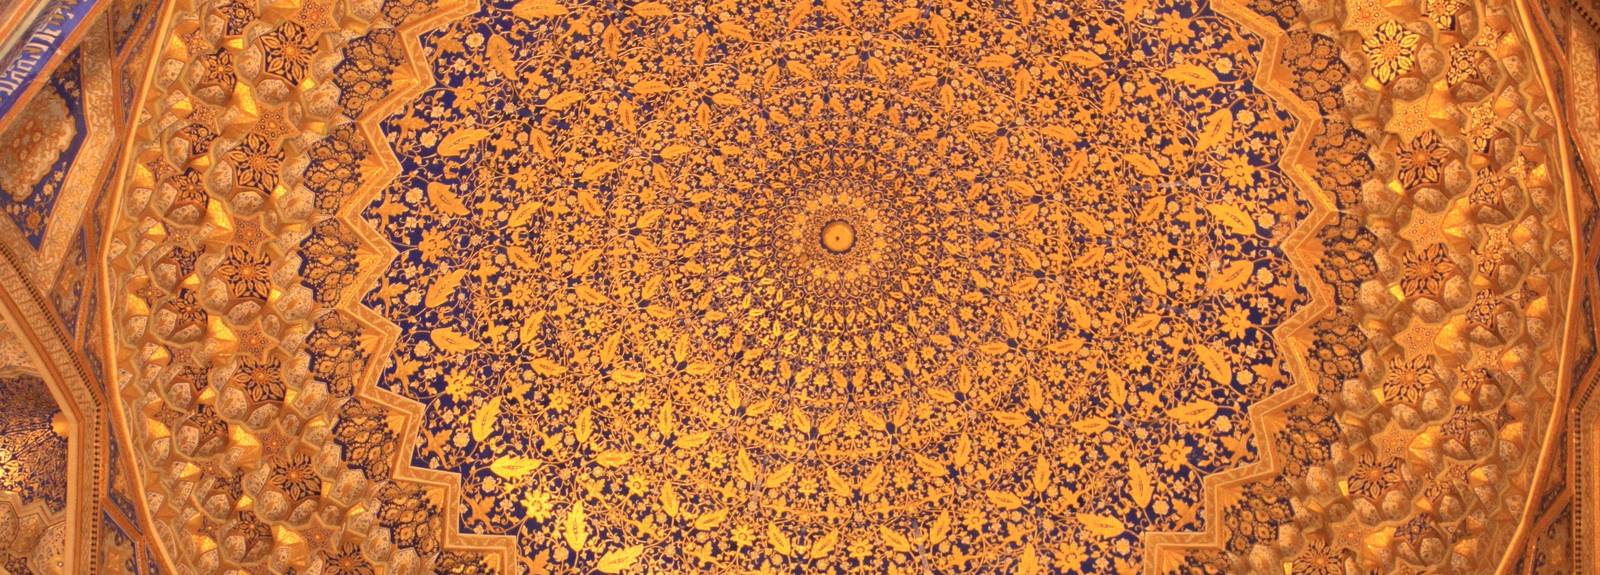 Tilla-Kari Medressa  Registan Samarkand, Oezbekistan